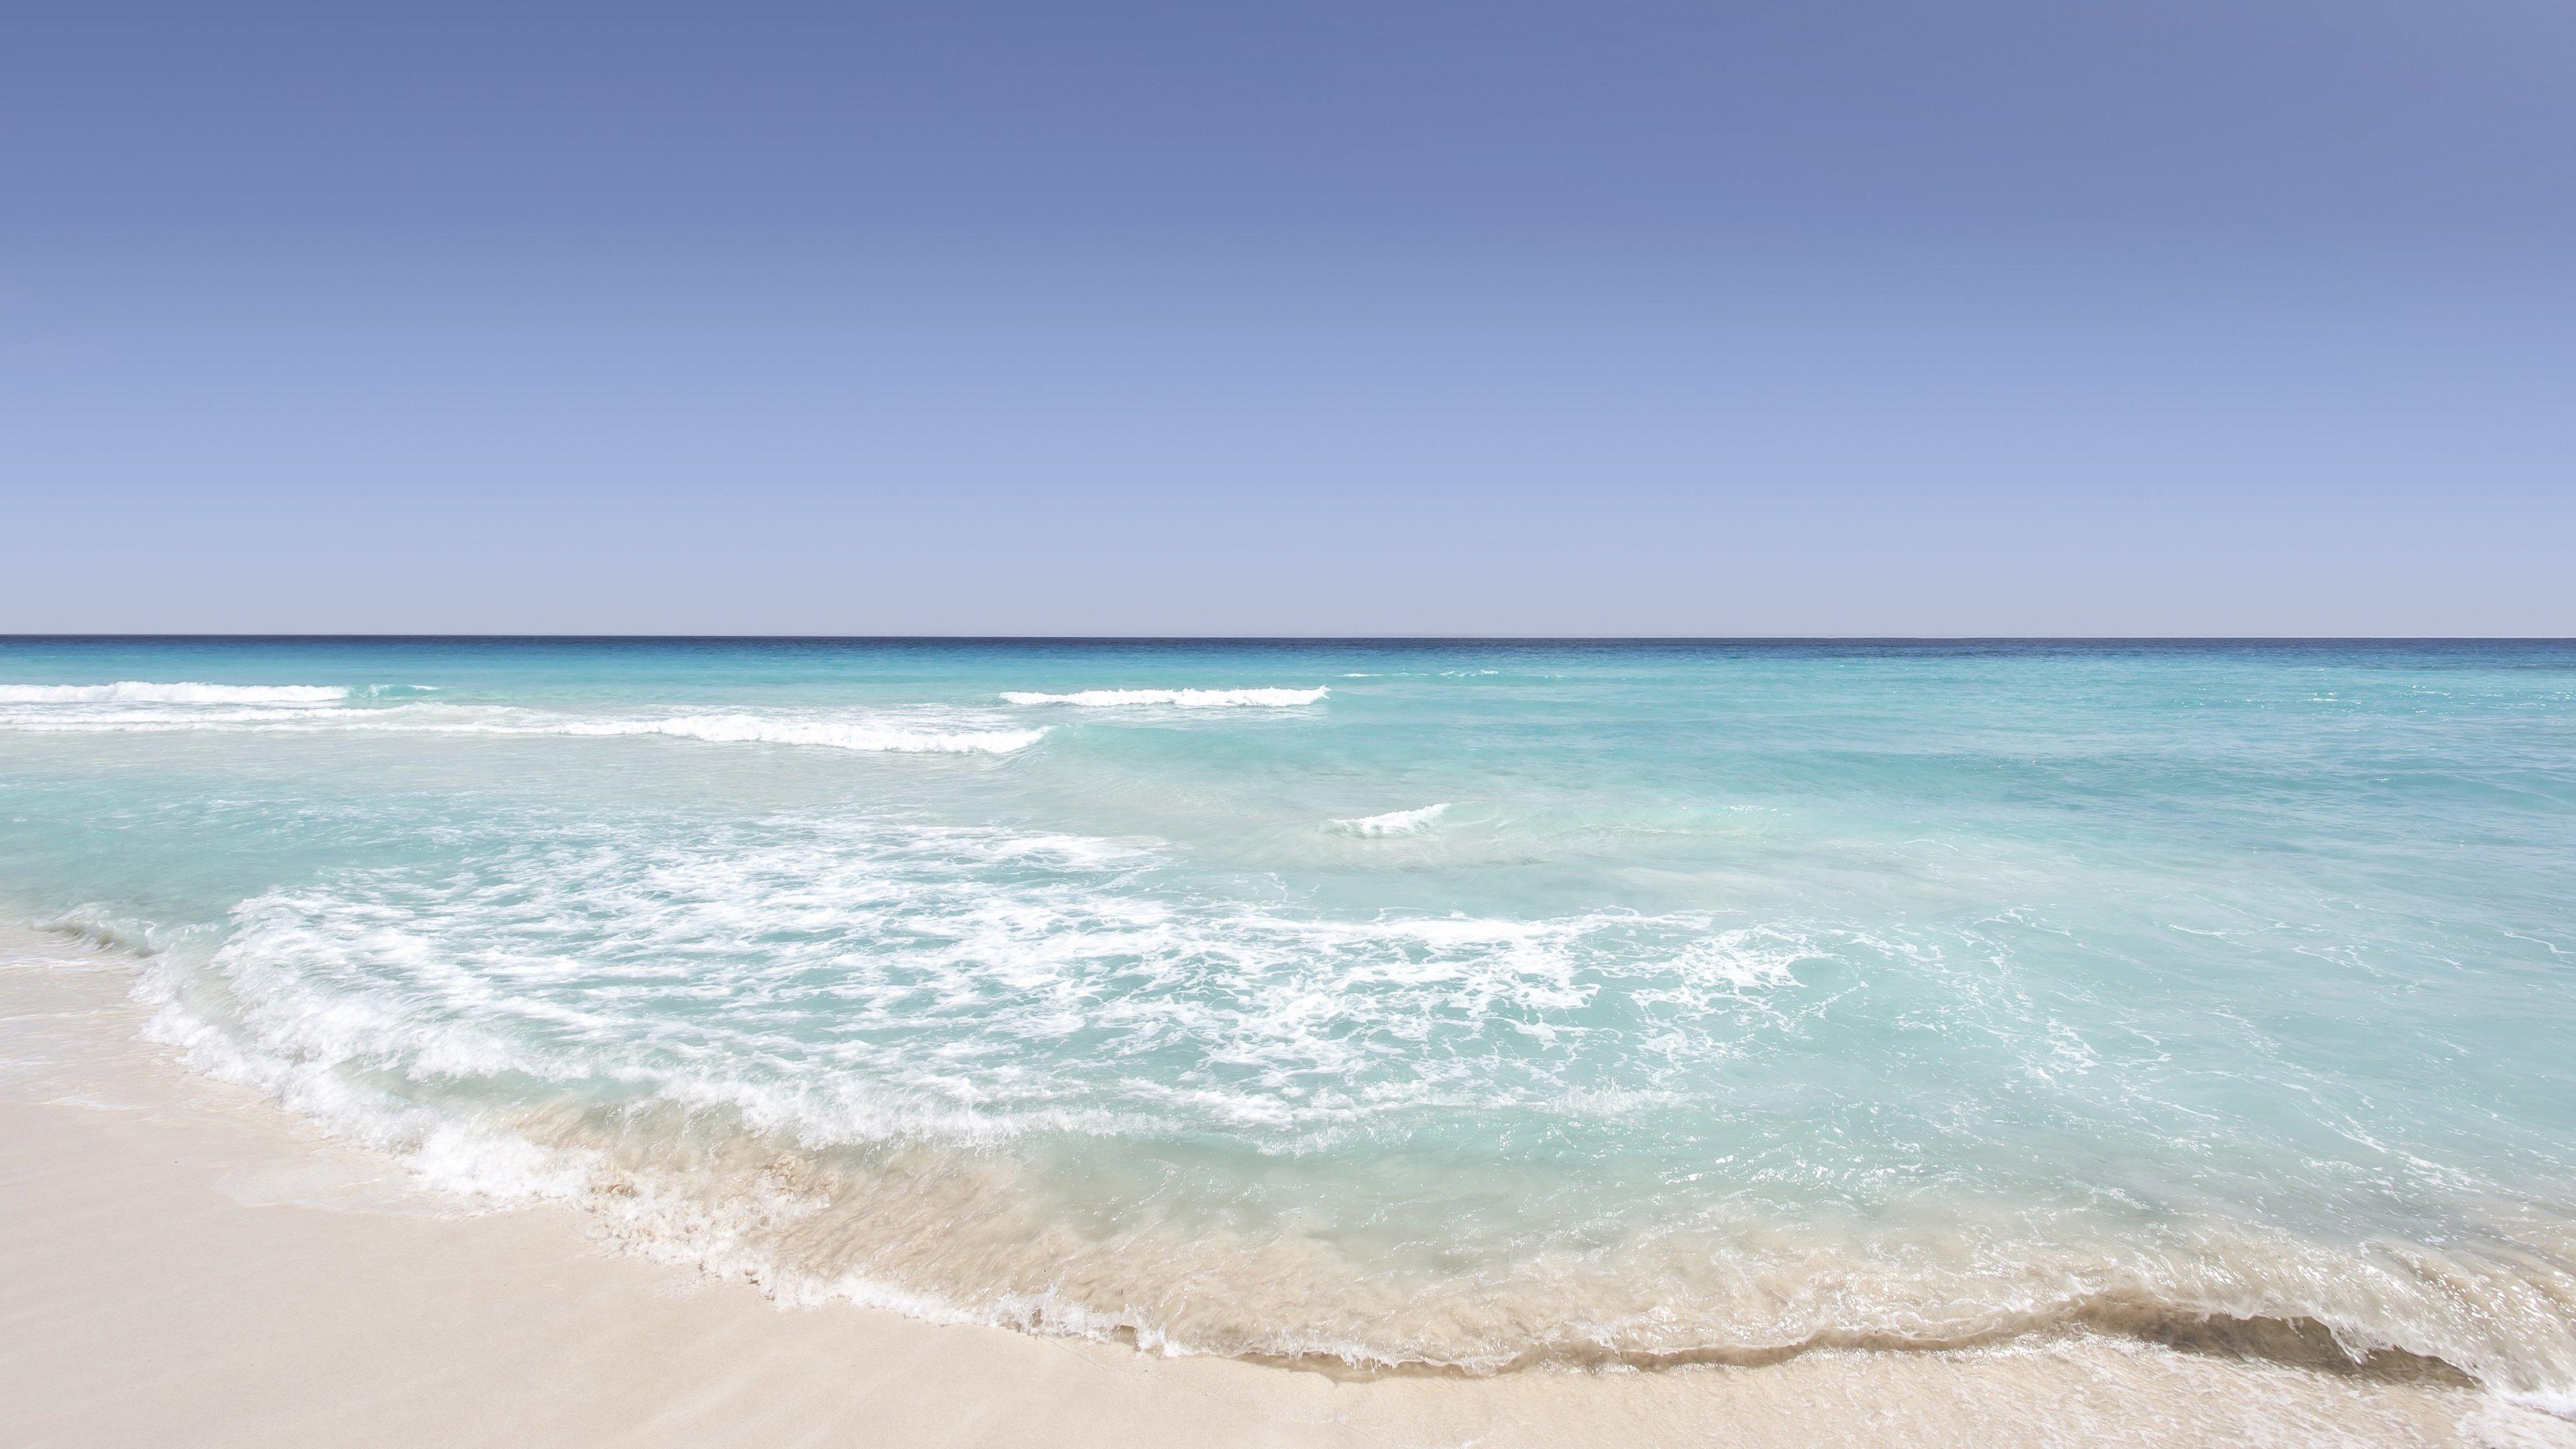 Sandy Beach Wallpaper: Mobile & Desktop Background